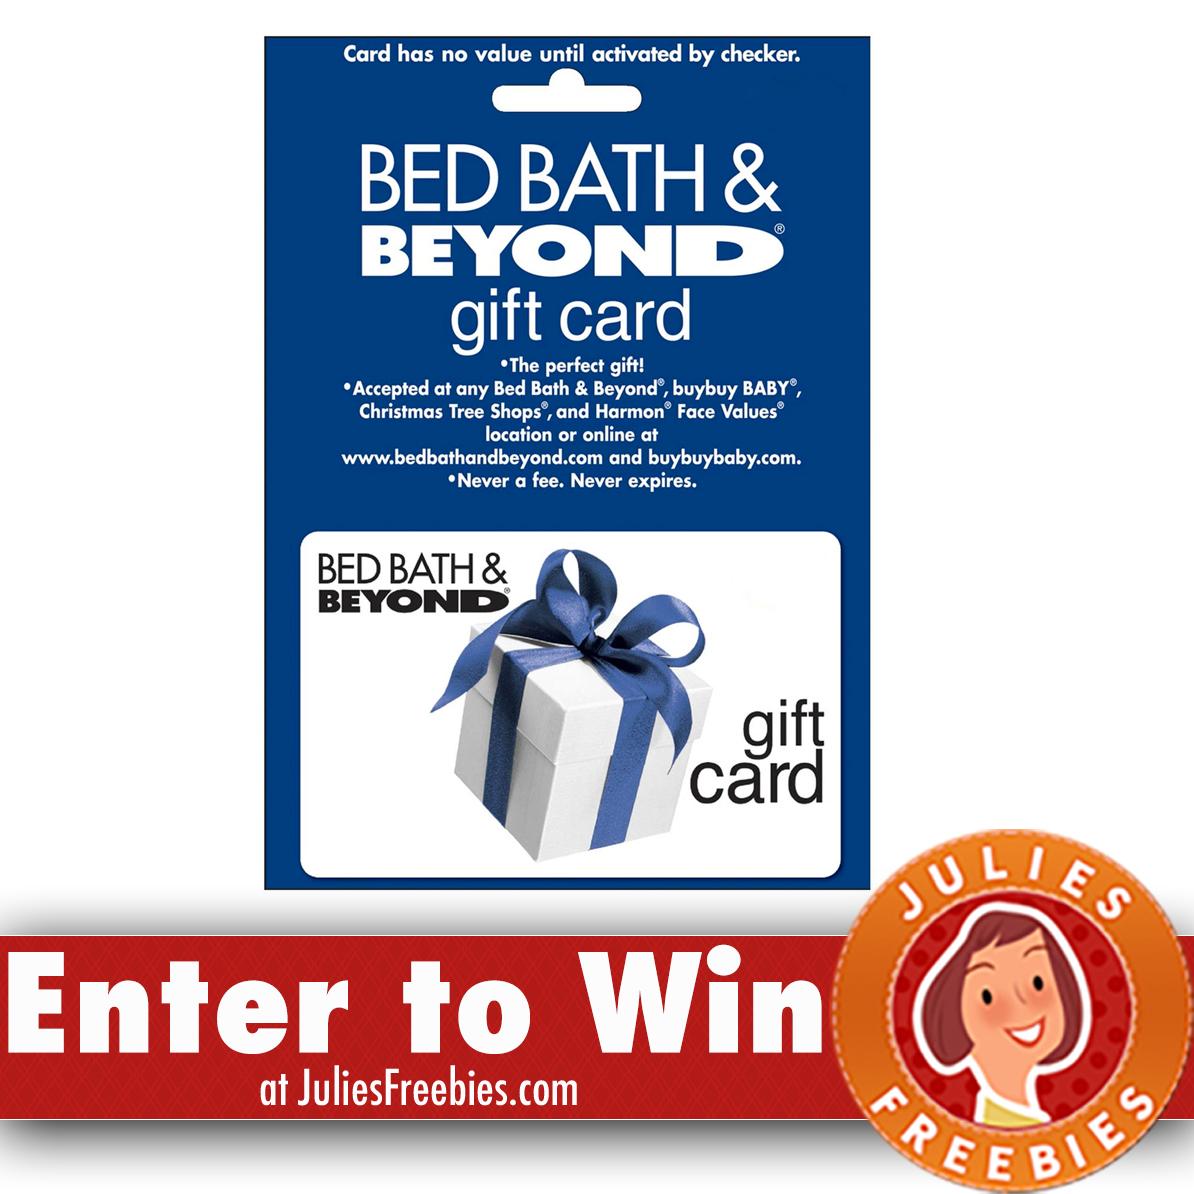 Win a $200.00 Bed Bath & Beyond Gift Card - Julie's Freebies